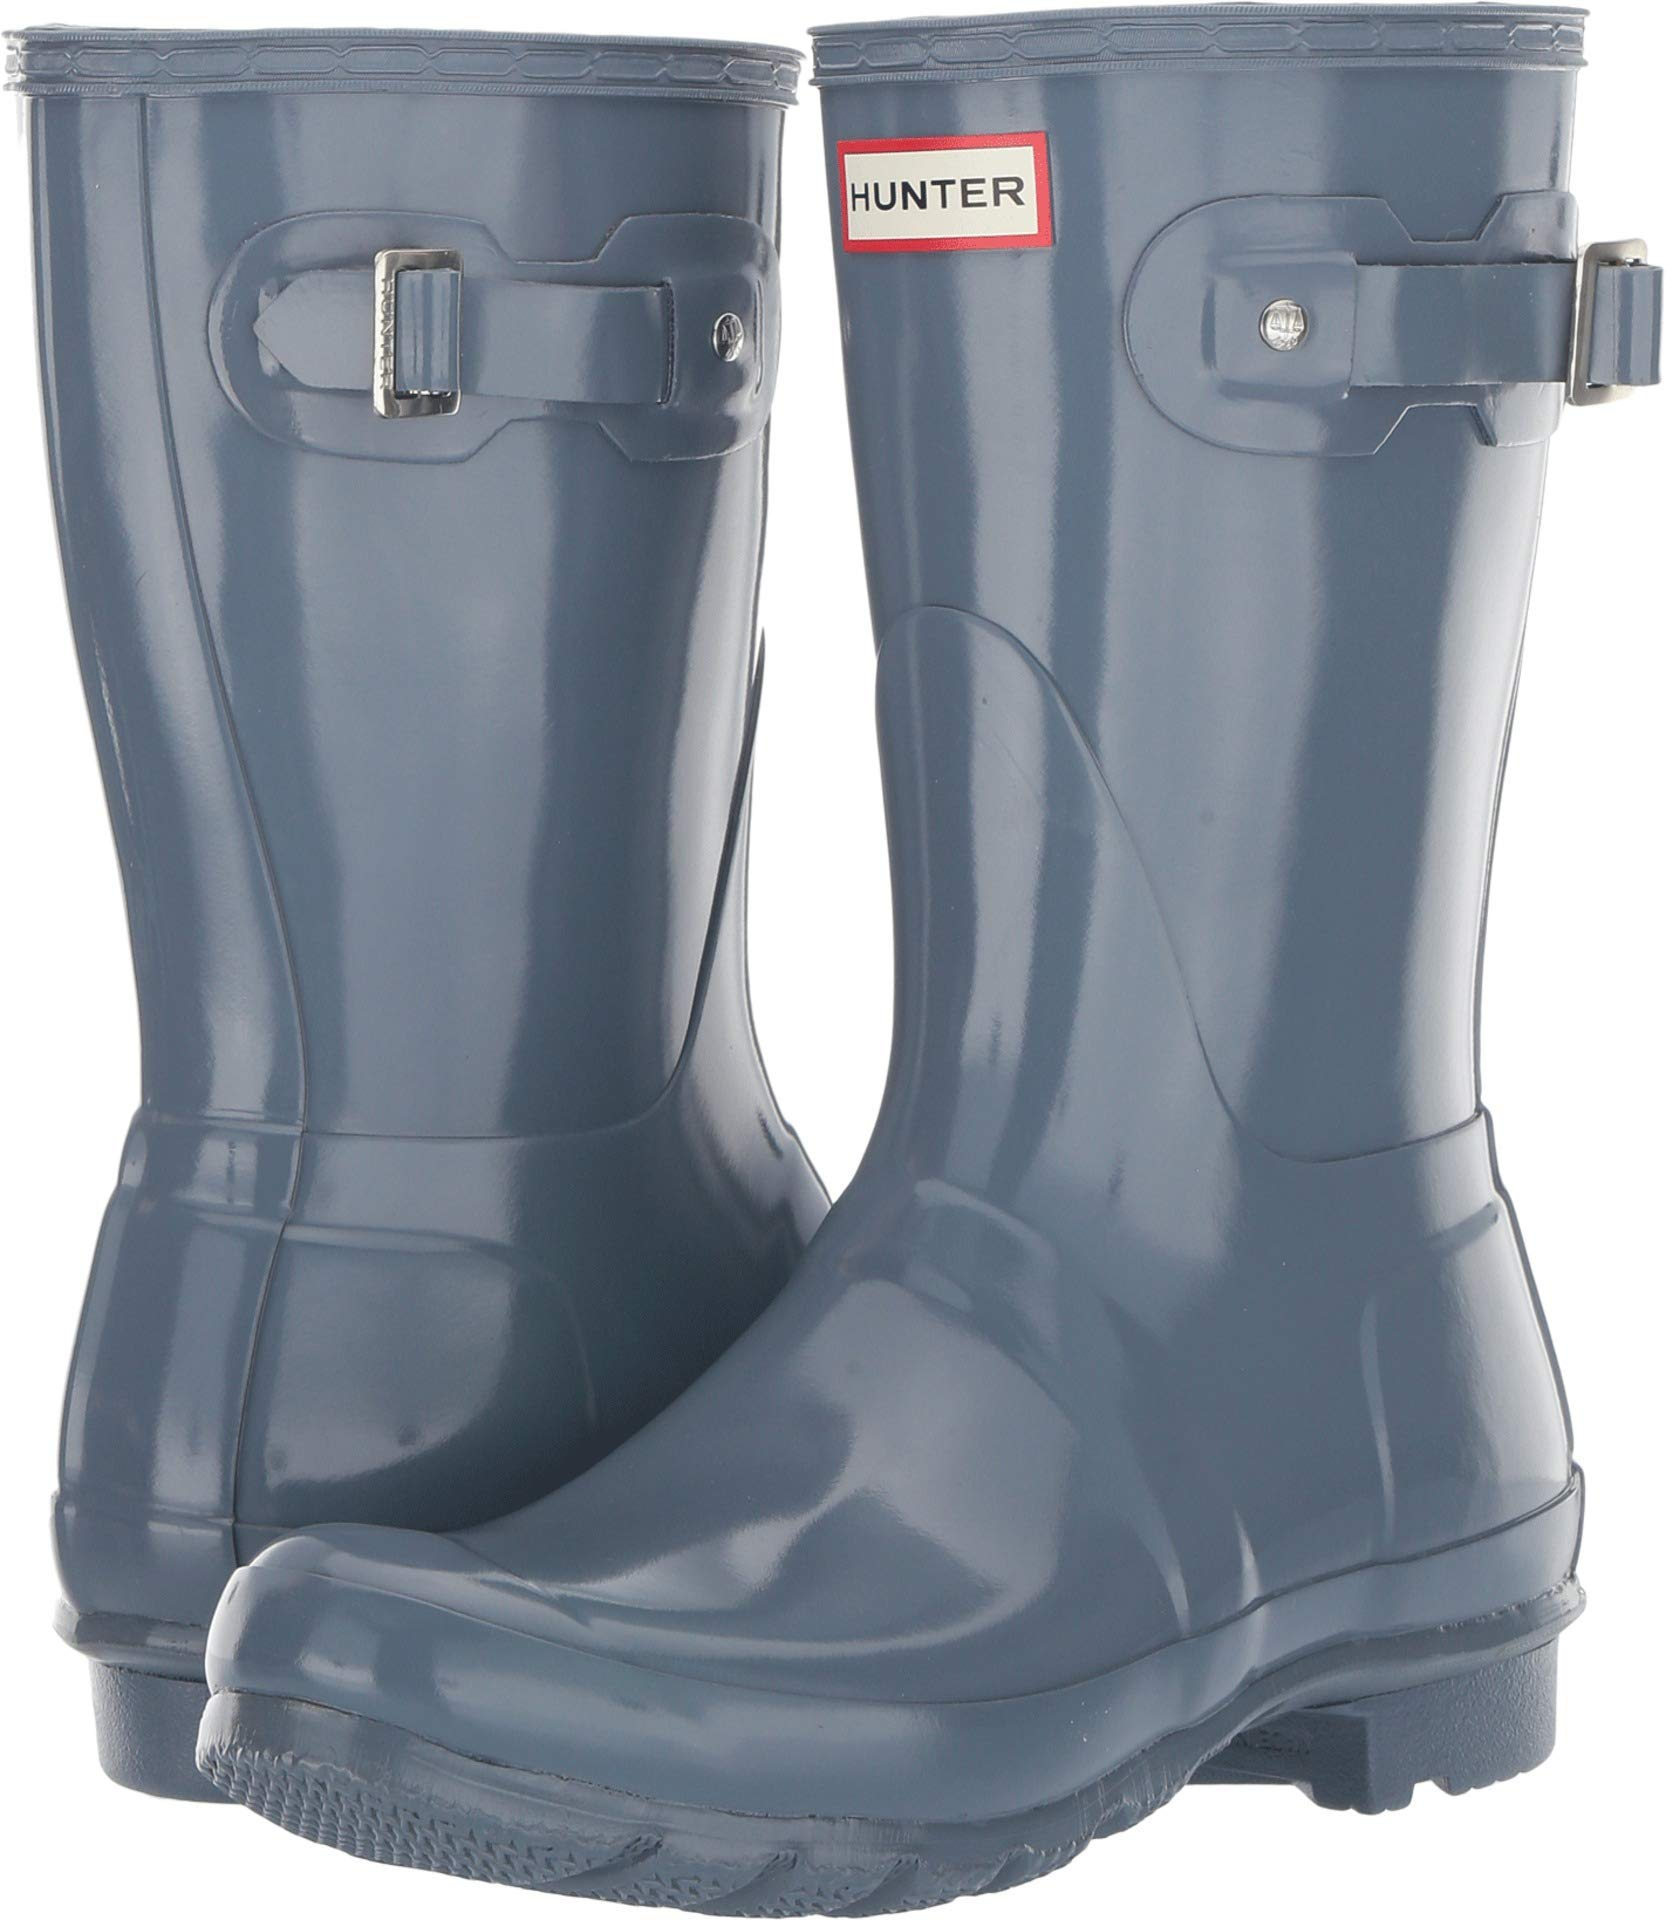 Hunter Women's Original Short Gloss Rain Boots Gull Grey 9 M US